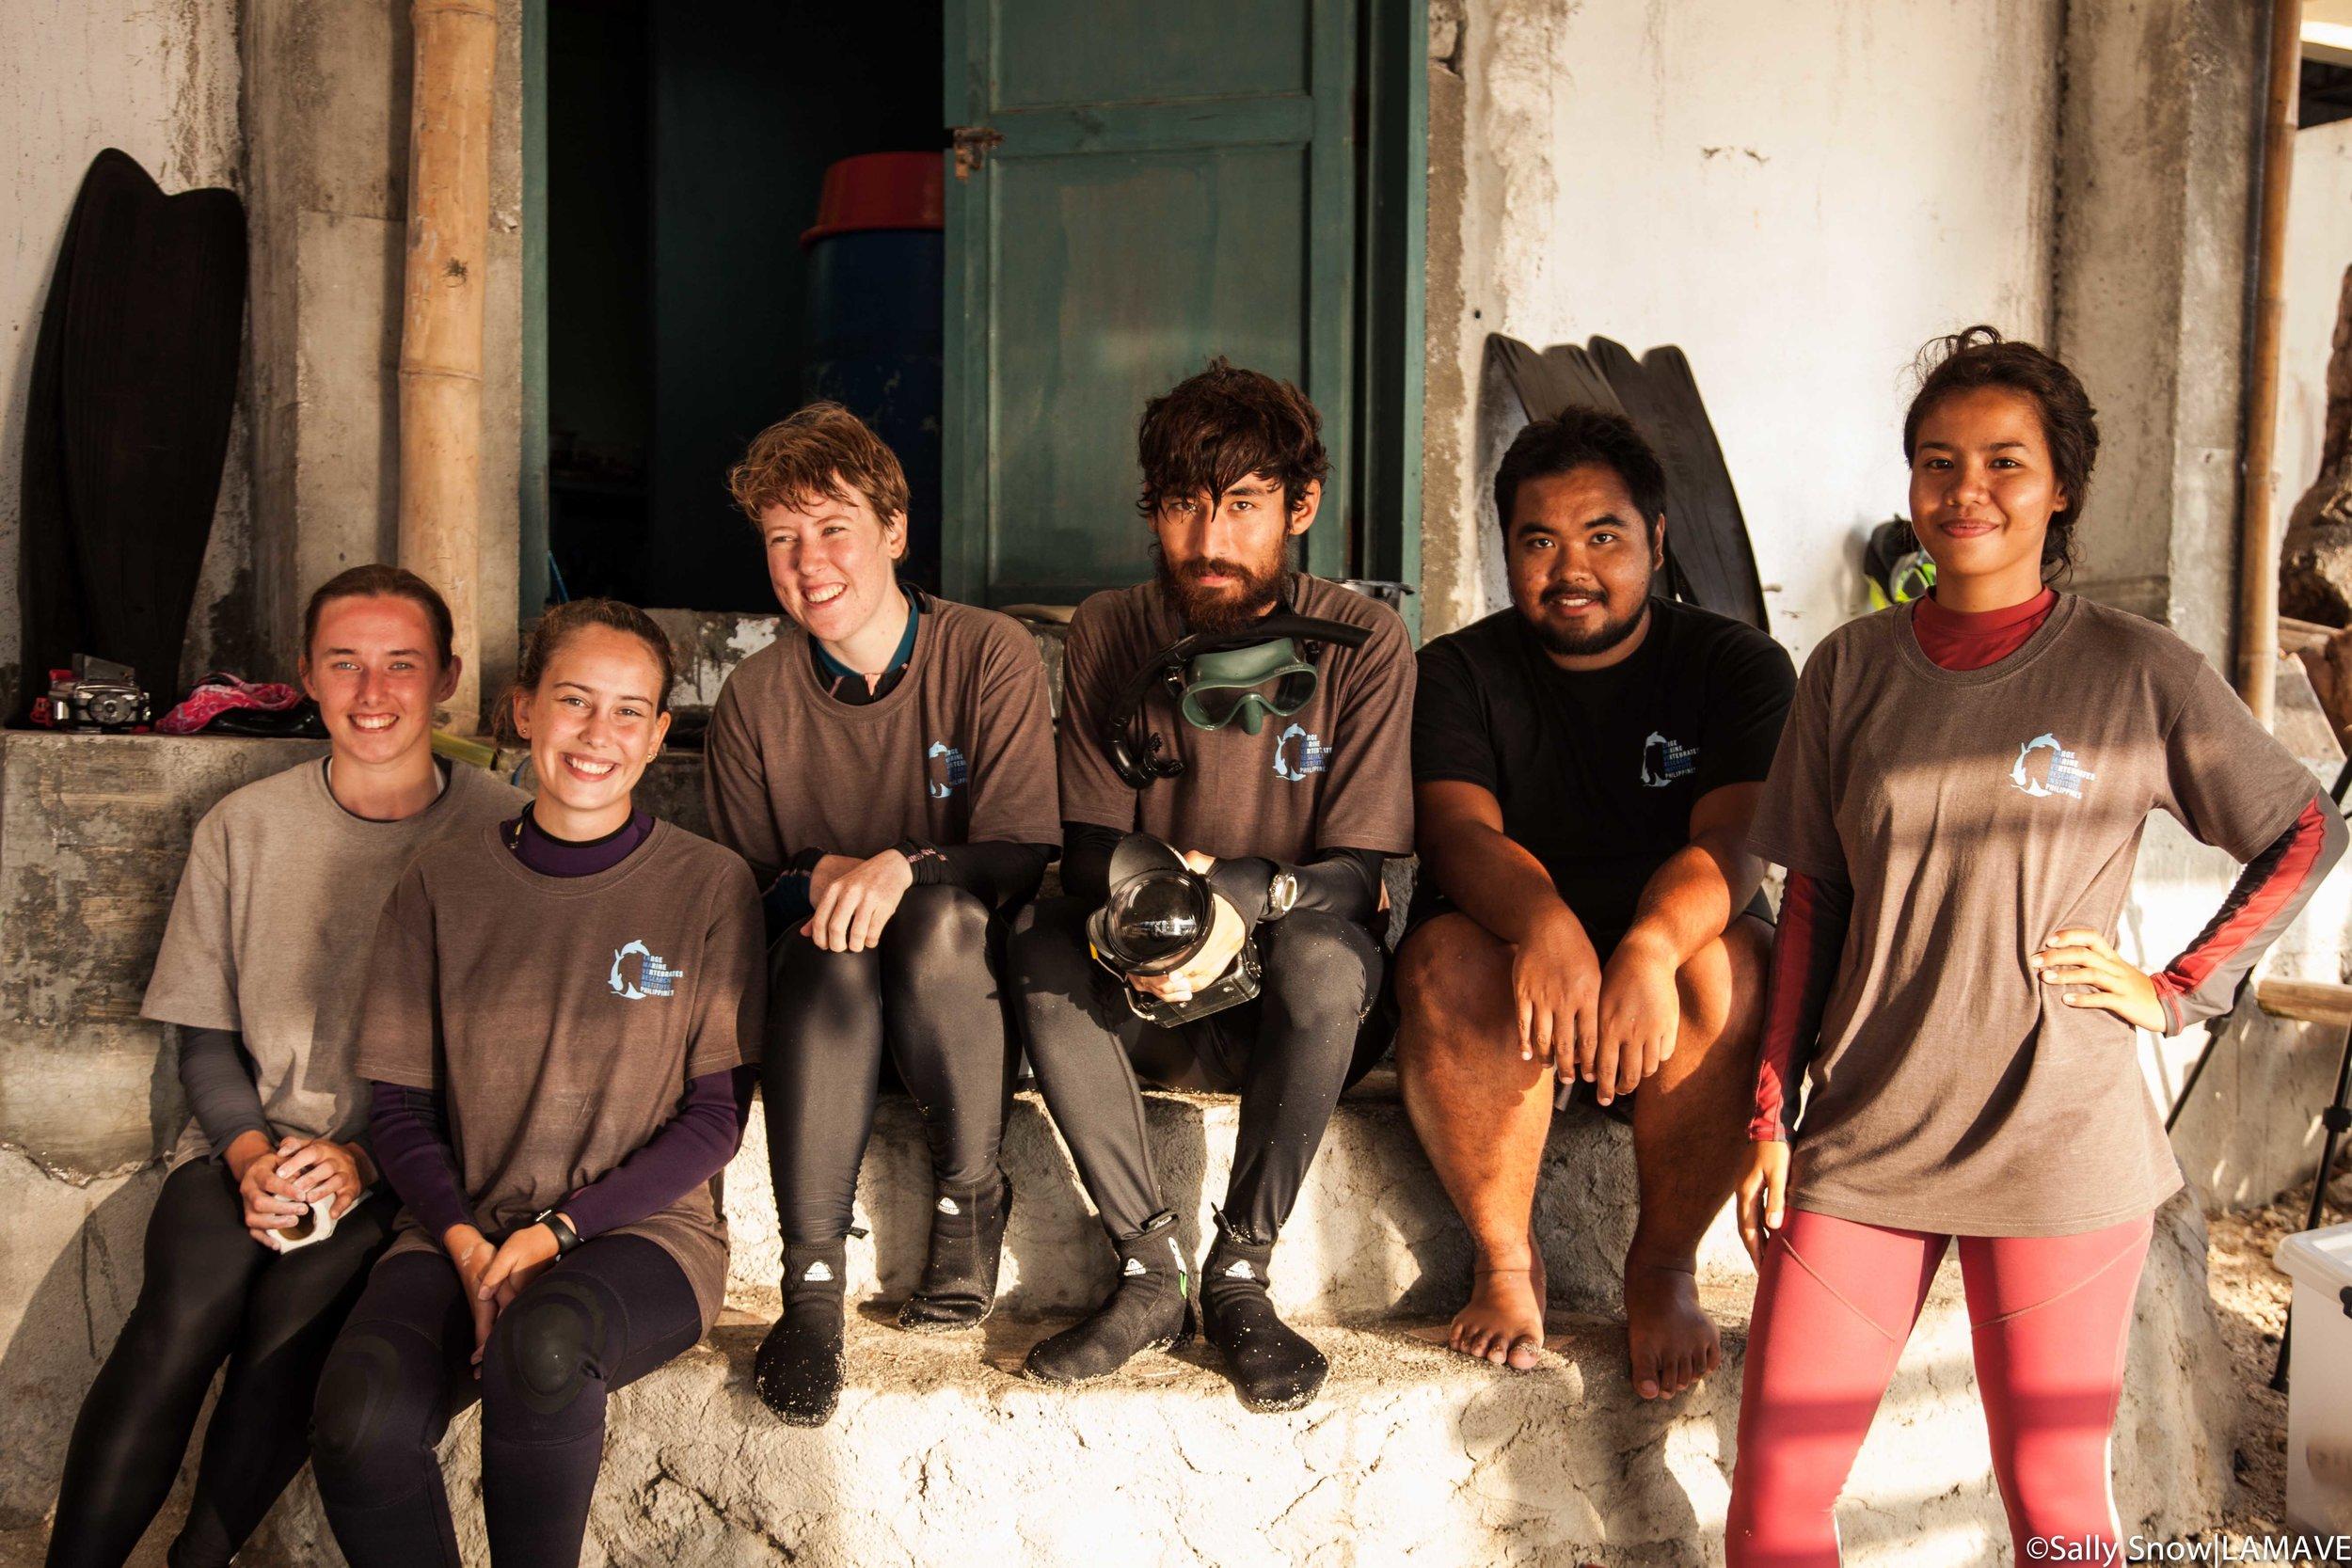 lamave-apo-island-volunteer-team-2018-sally-snow-IMG_0469.jpg